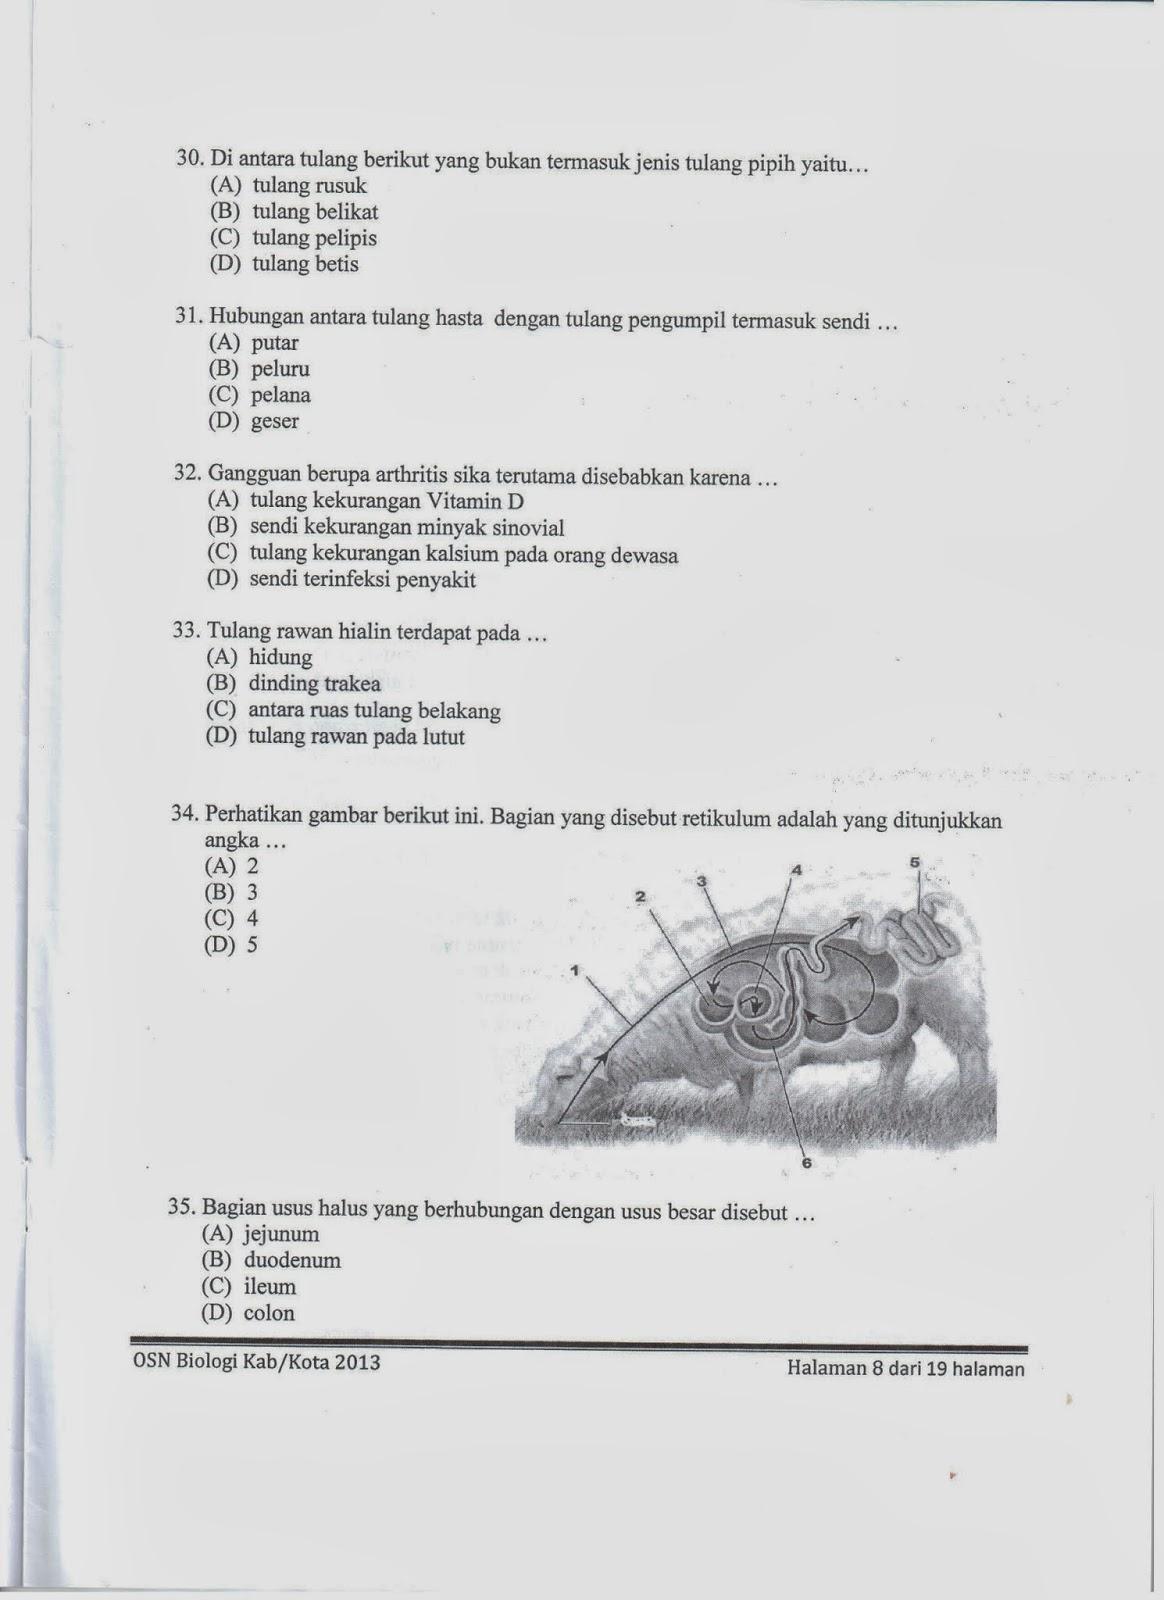 Rumah Kaca: Soal OSN Biologi SMP Tingkat Kabupaten/Kota